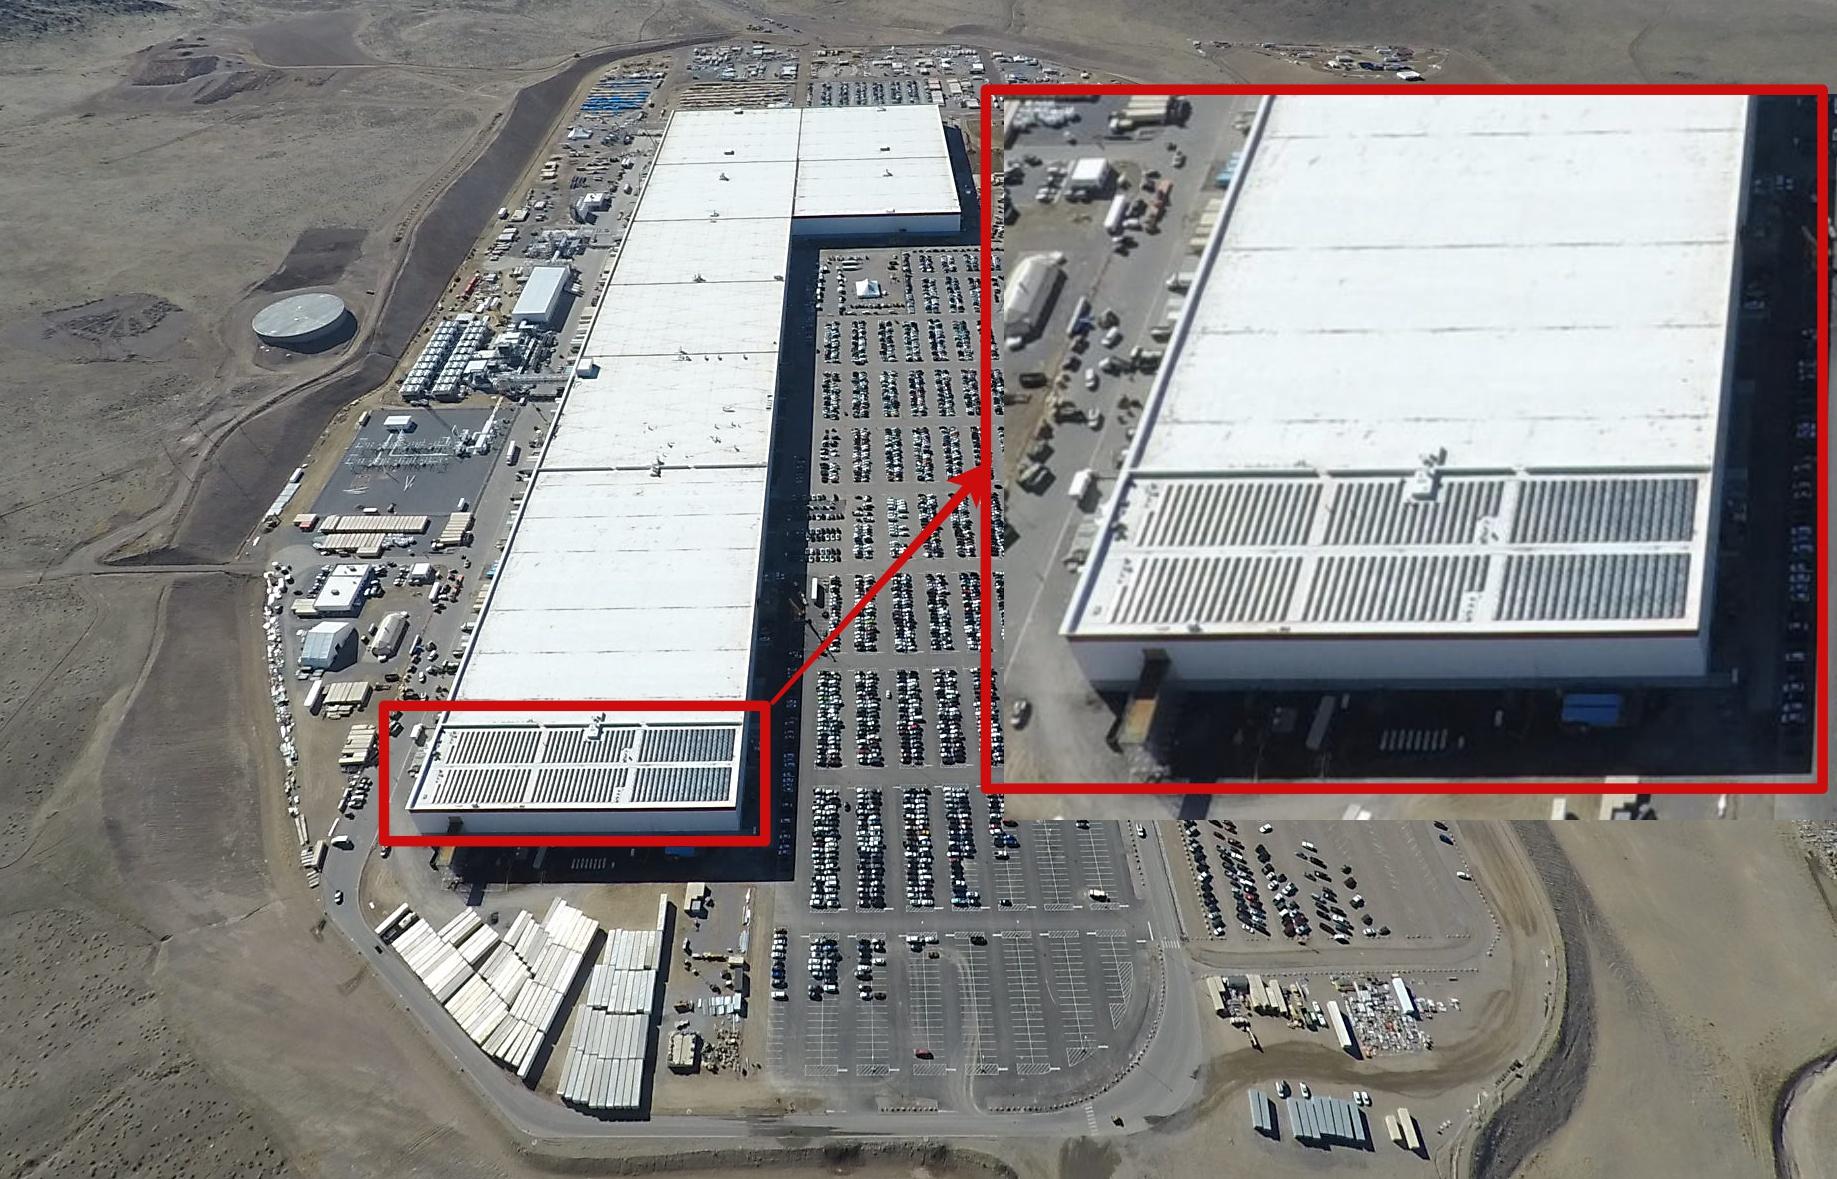 Tesla Powerwall Price >> Tesla Gigafactory 1 rooftop solar array - TESLARATI